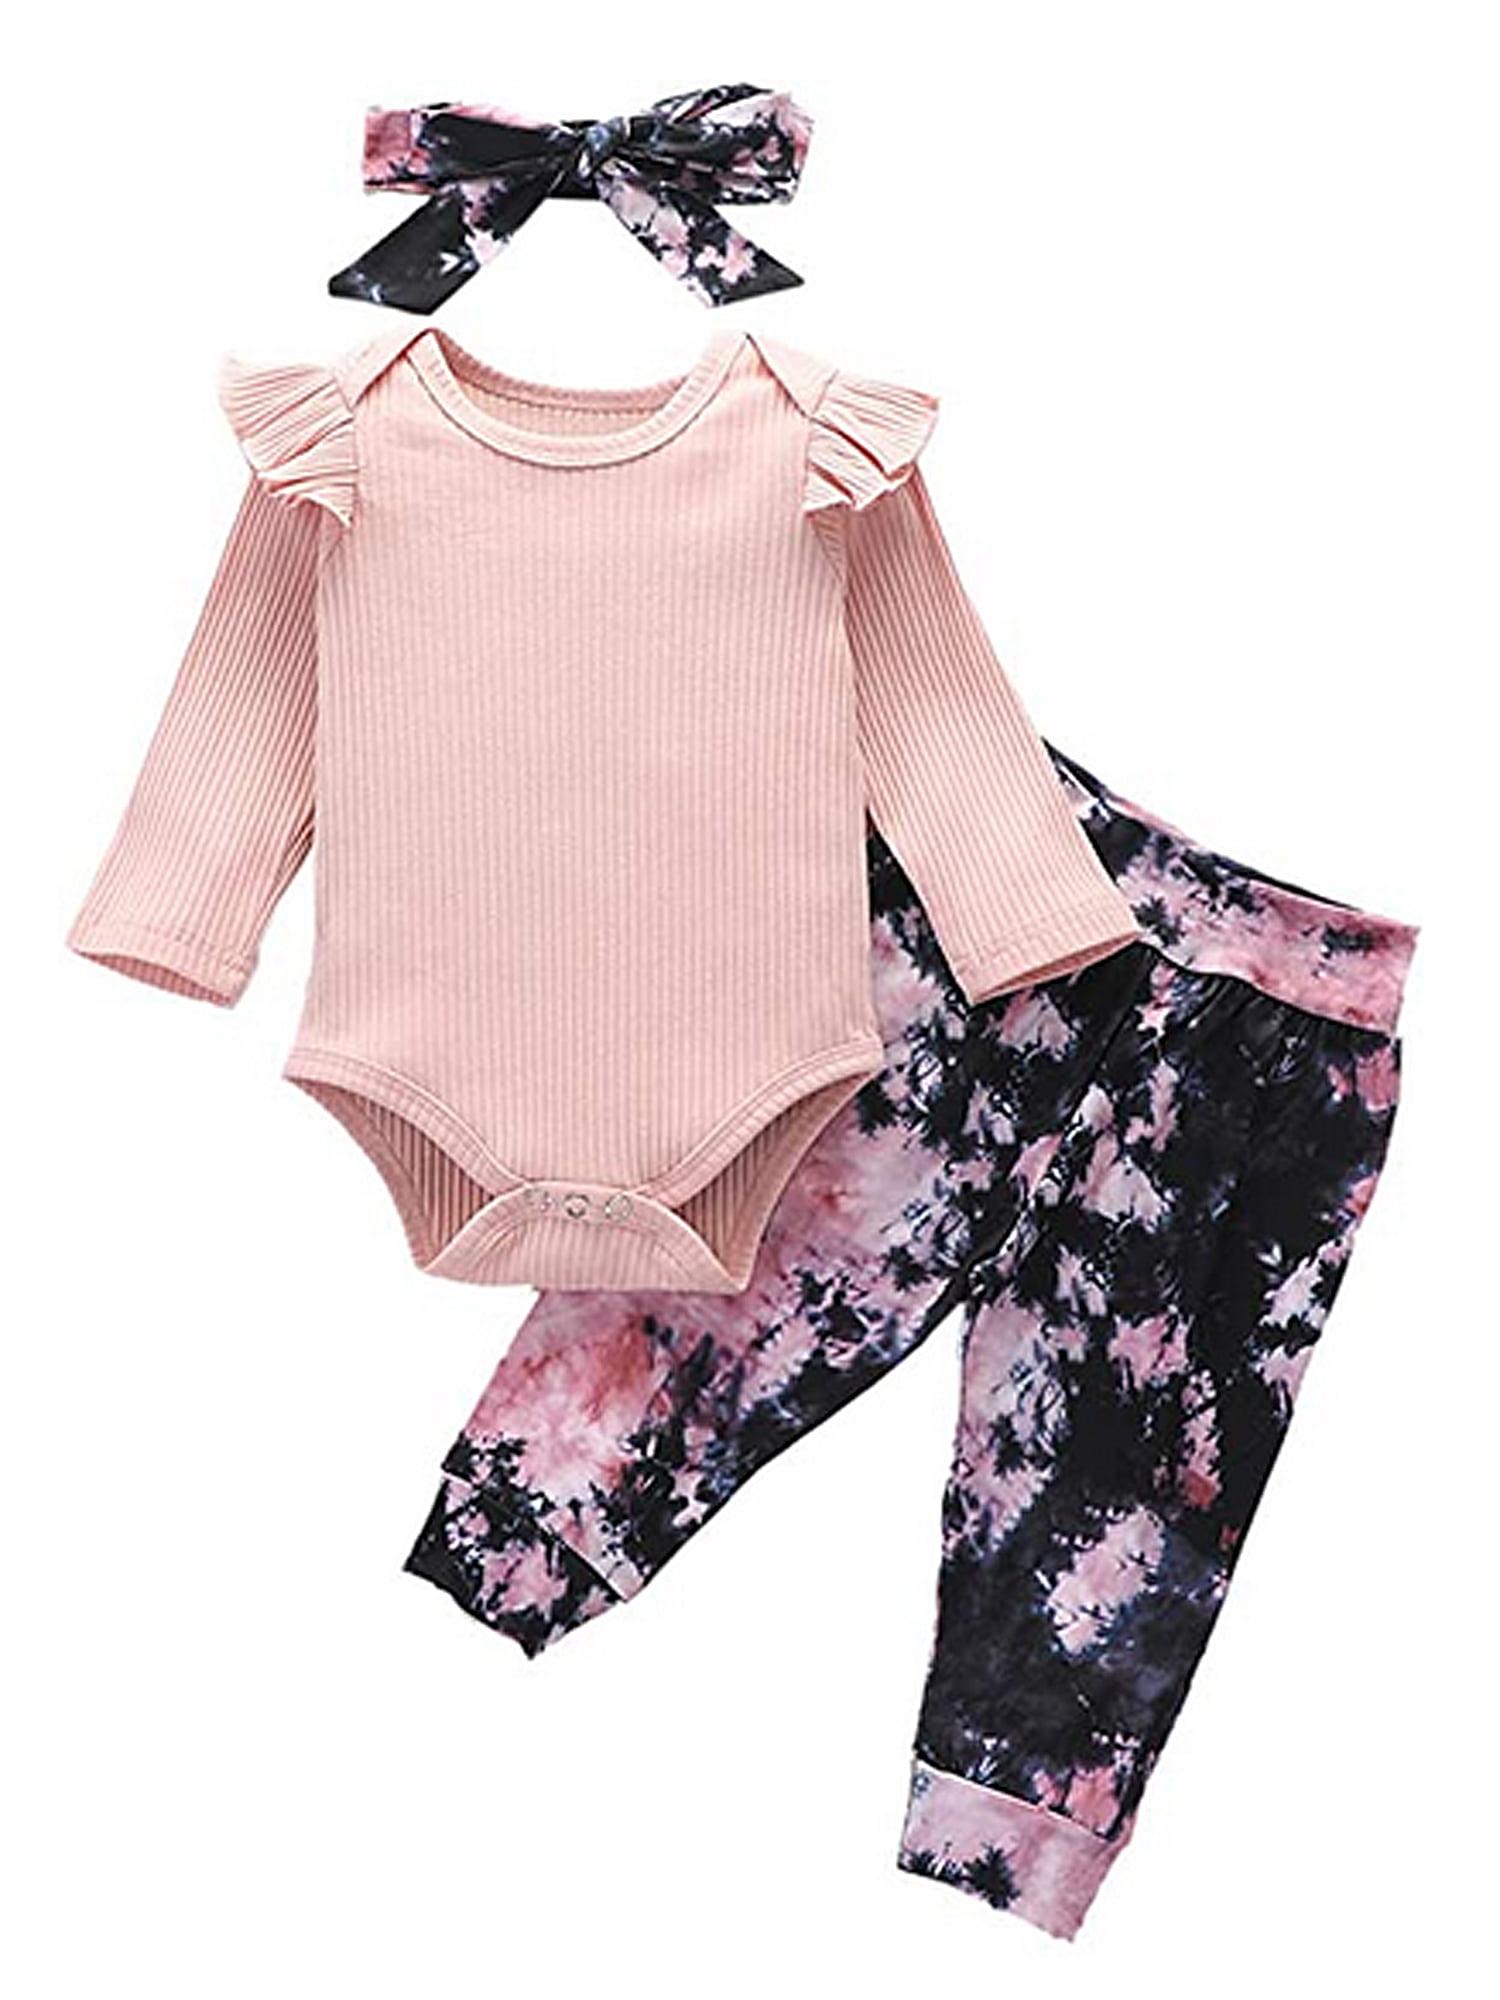 Newborn Baby Boys Girls Tie-Dye Ruffle Romper Pants+Headbands Outfit Set Clothes